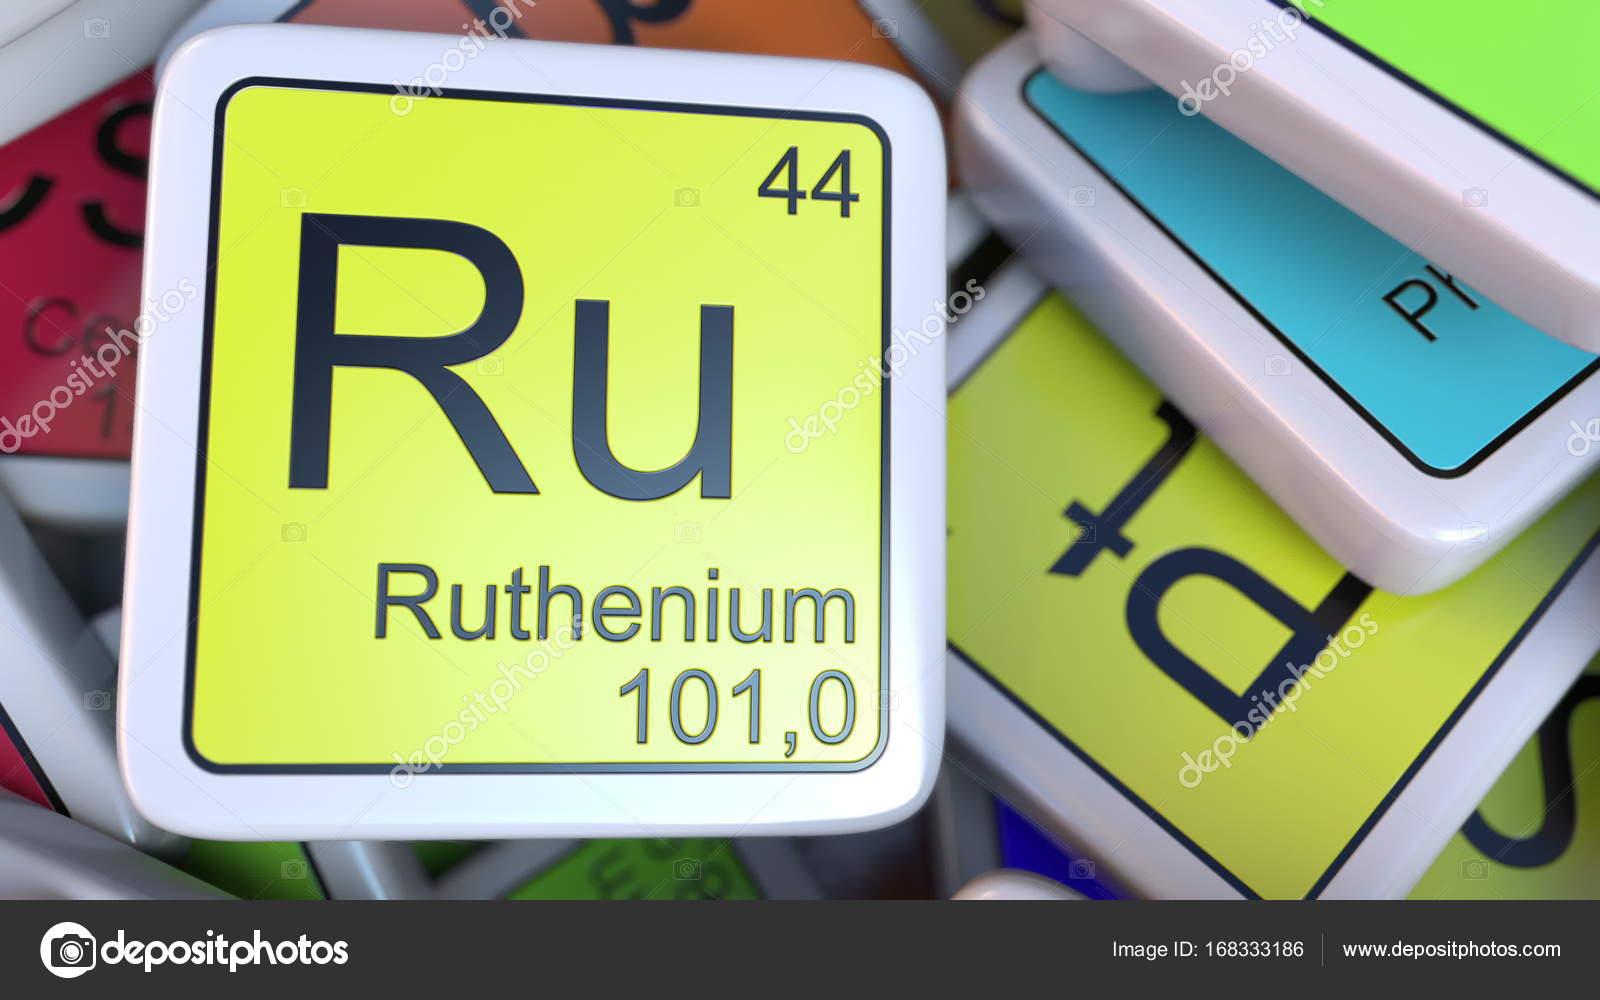 Bloque de ru rutenio en la pila de la tabla peridica de los bloques rutenio de la etiqueta de la pila de la tabla peridica de las etiquetas de elementos qumicos foto de alexeynovikov urtaz Gallery